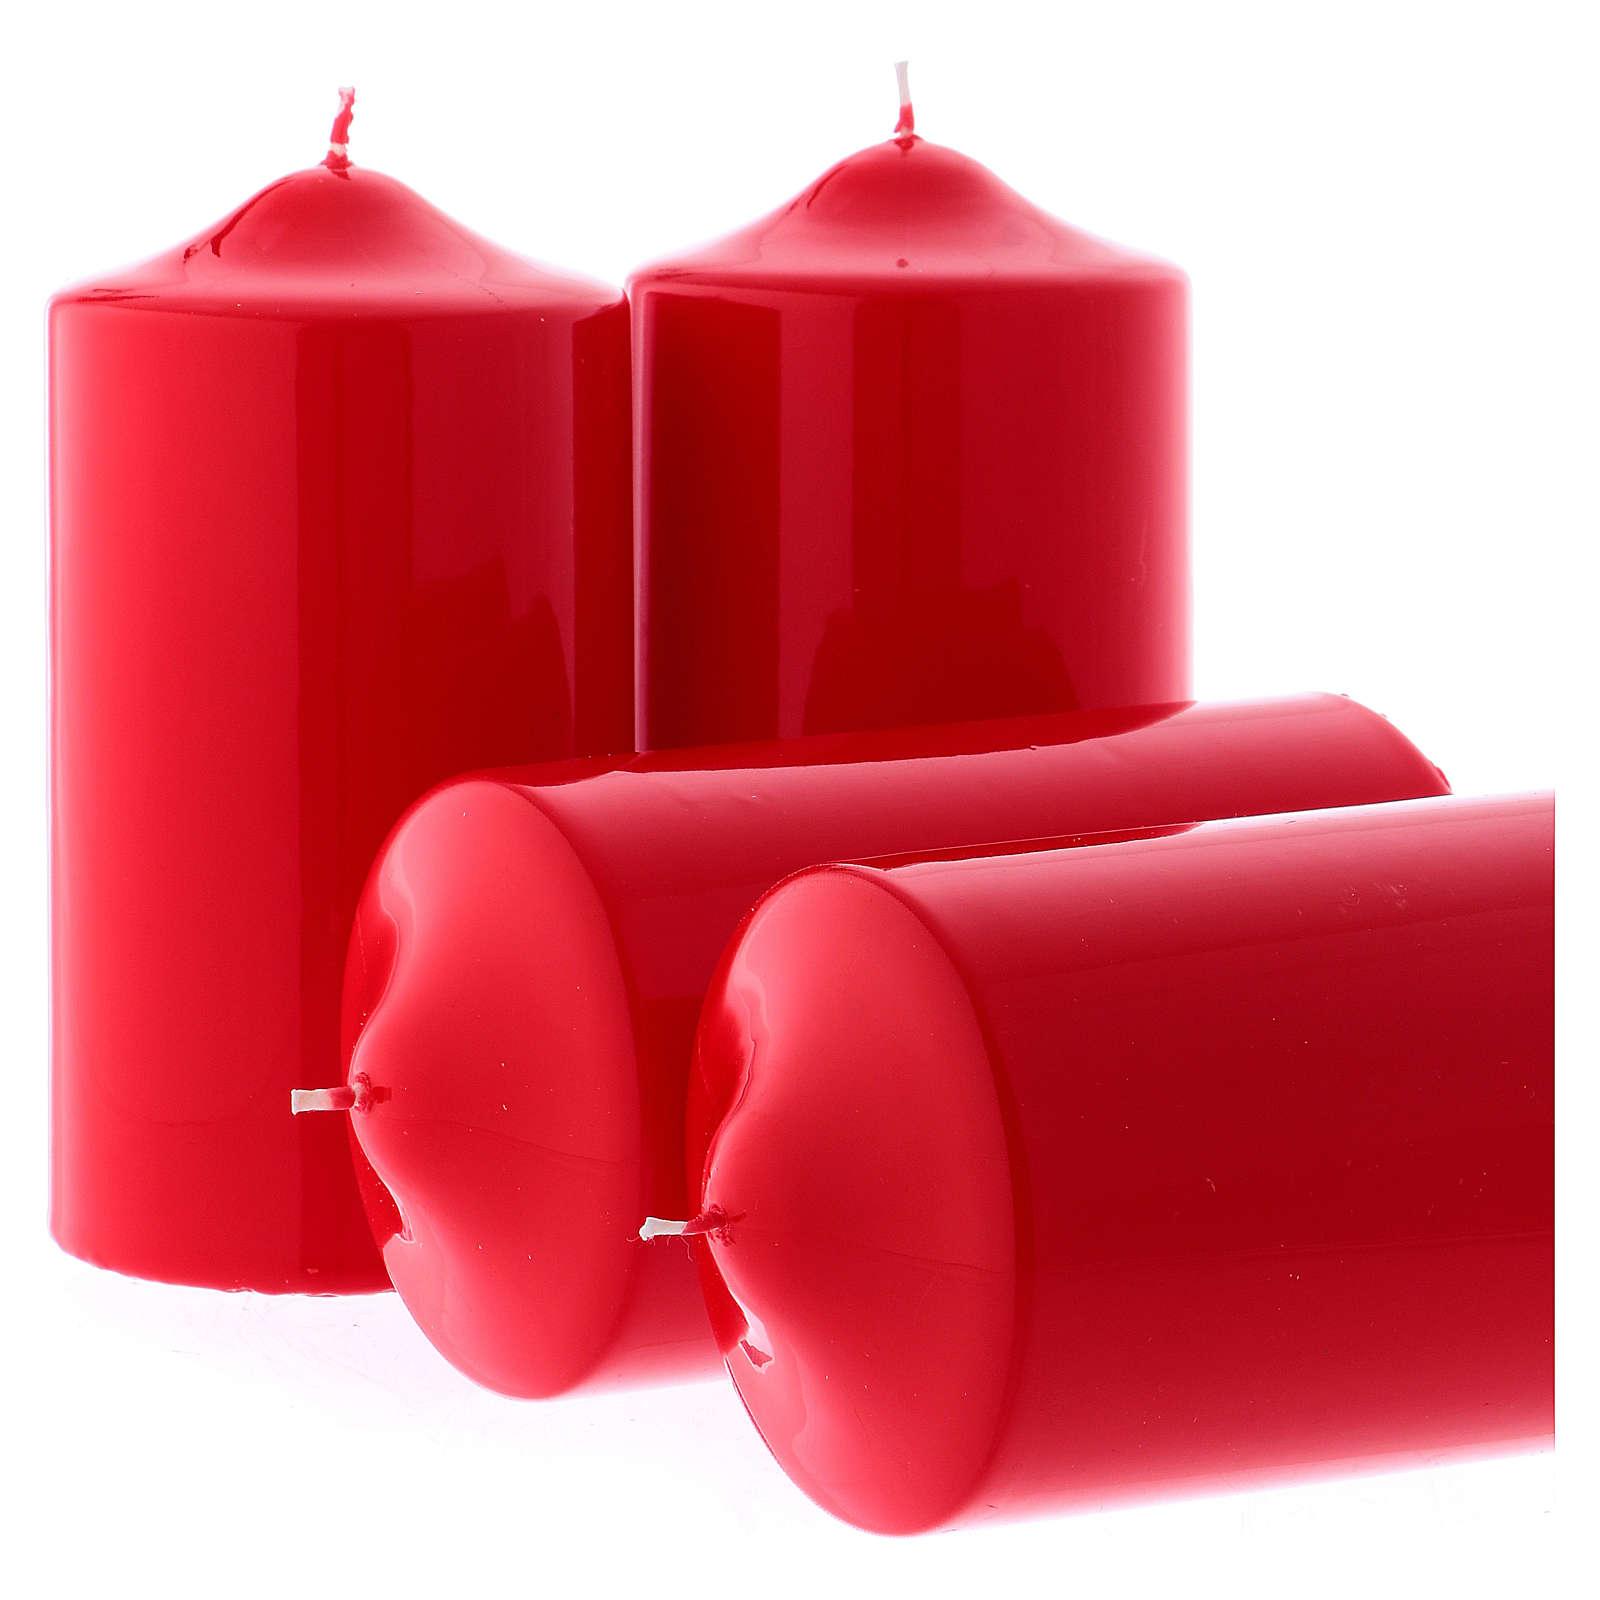 Candele lucide rosse per l' Avvento kit 8x15 cm 3